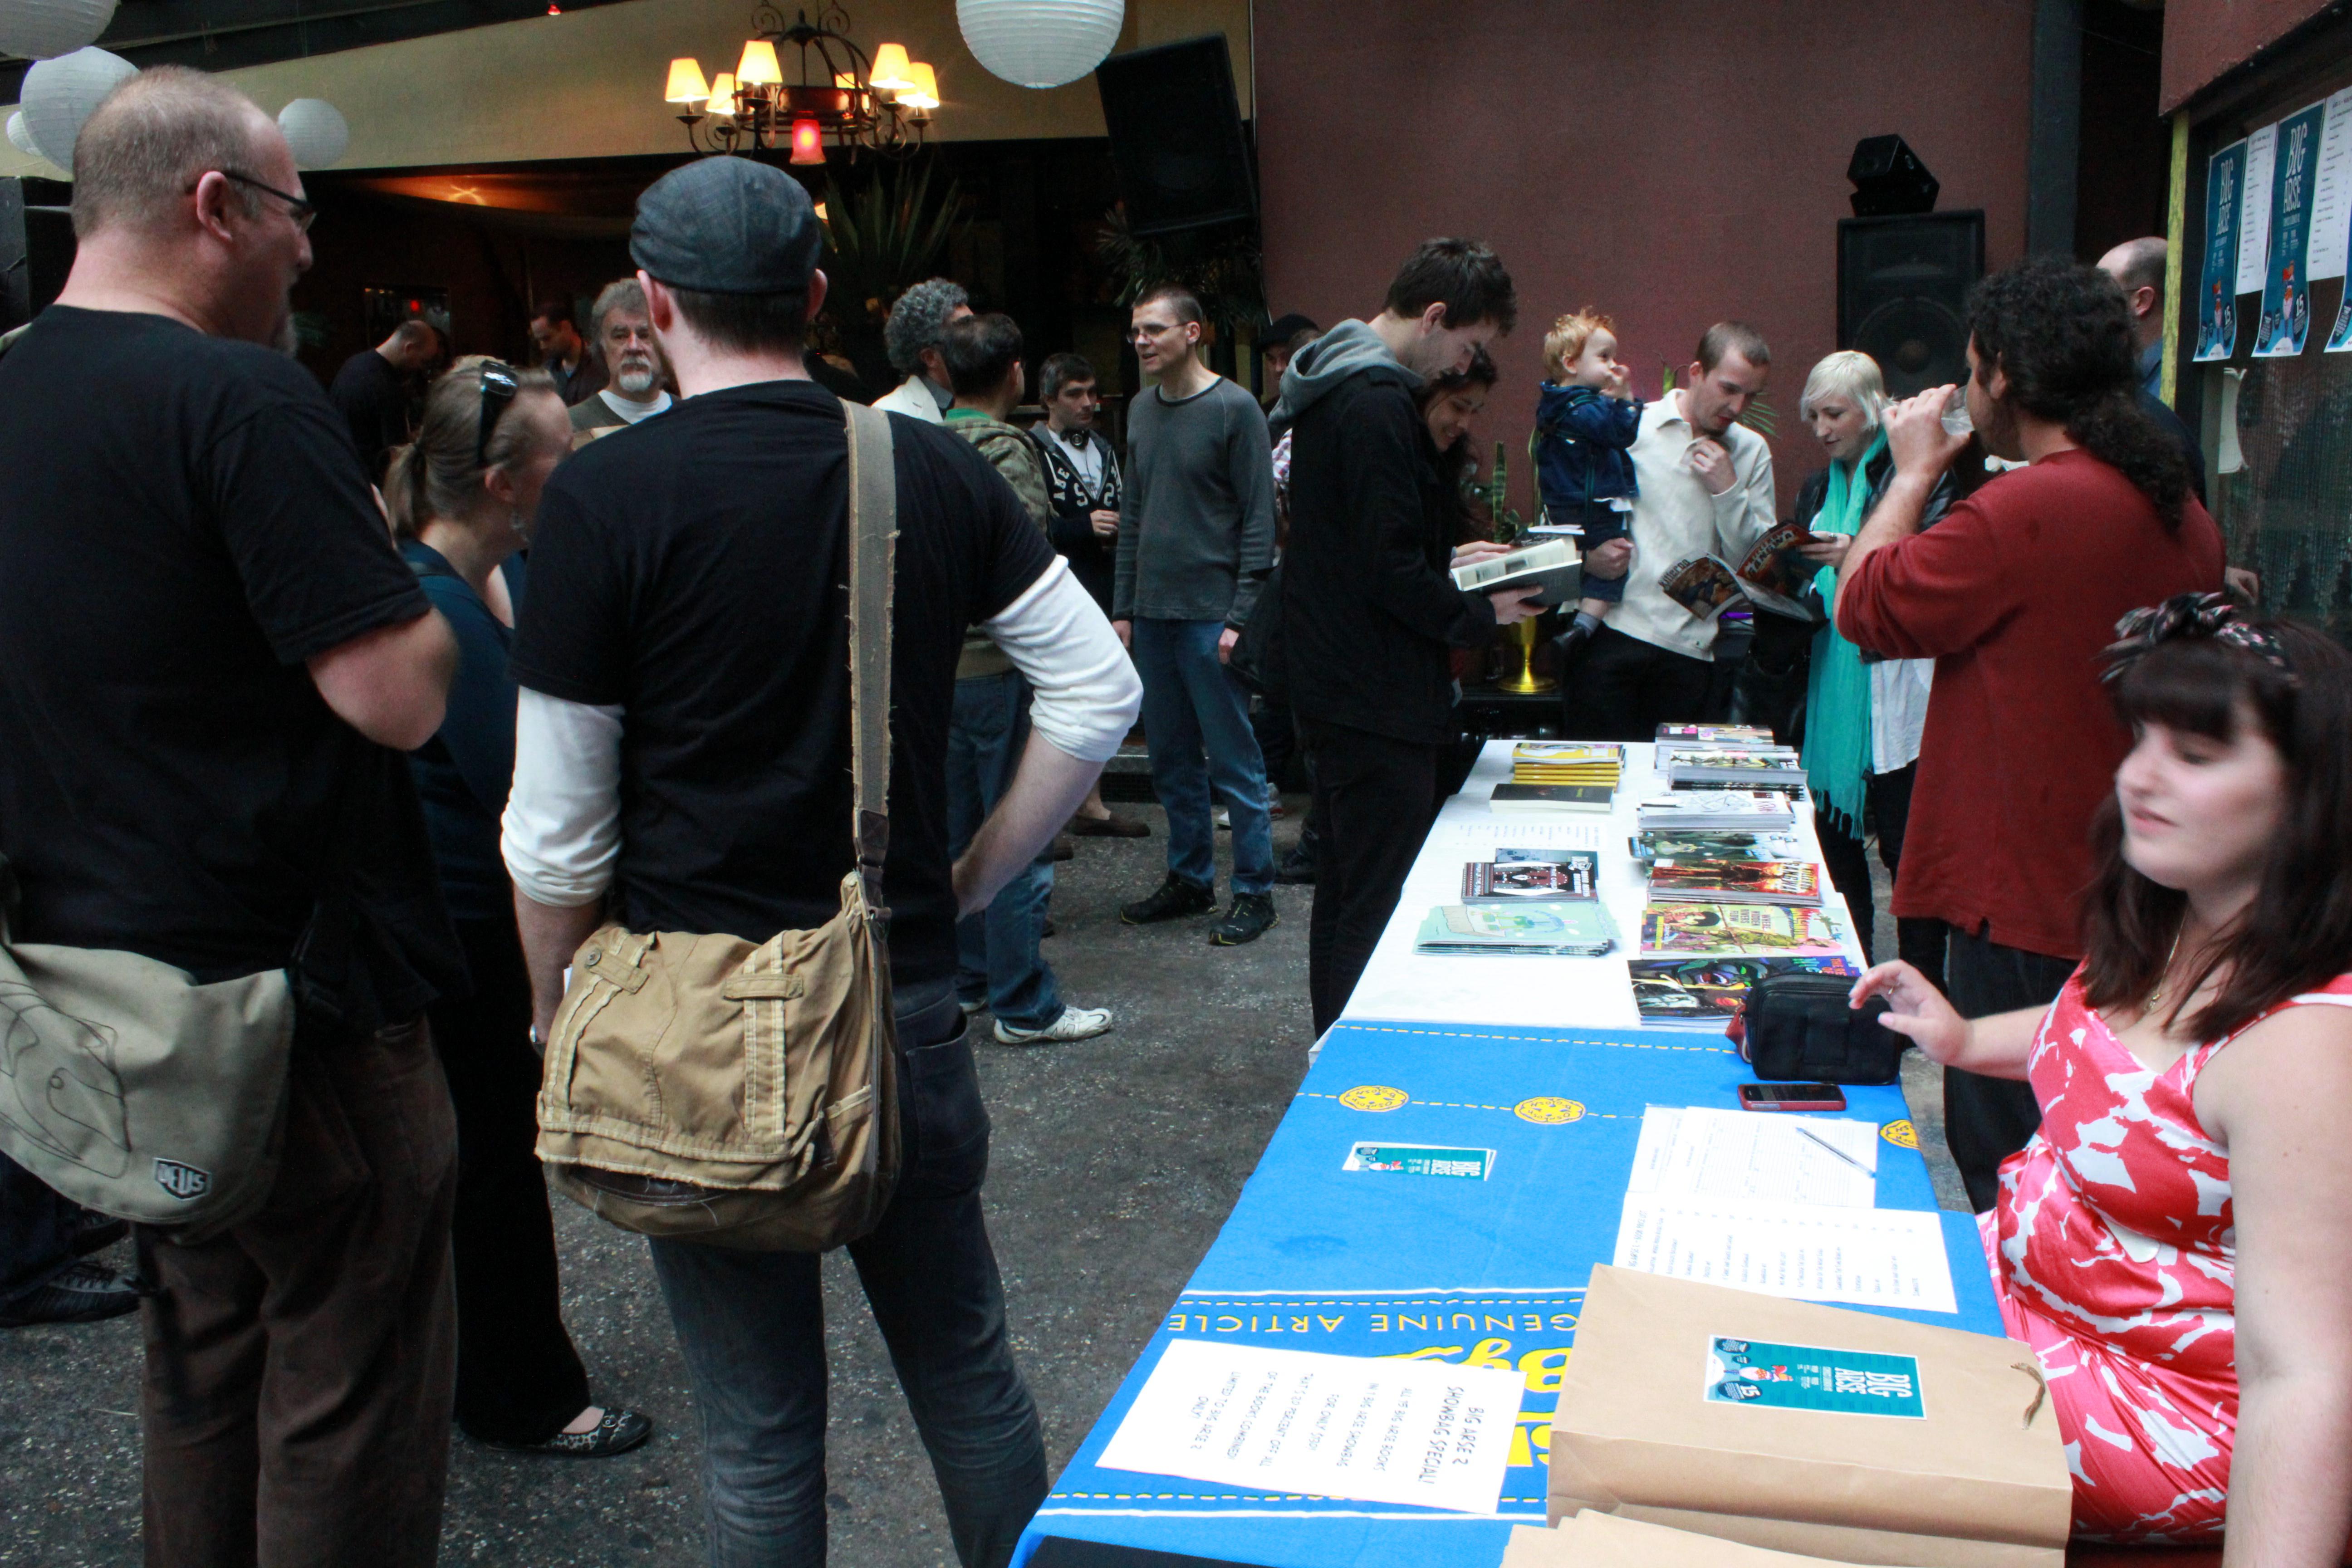 Big Arse Comic Book launch 2012